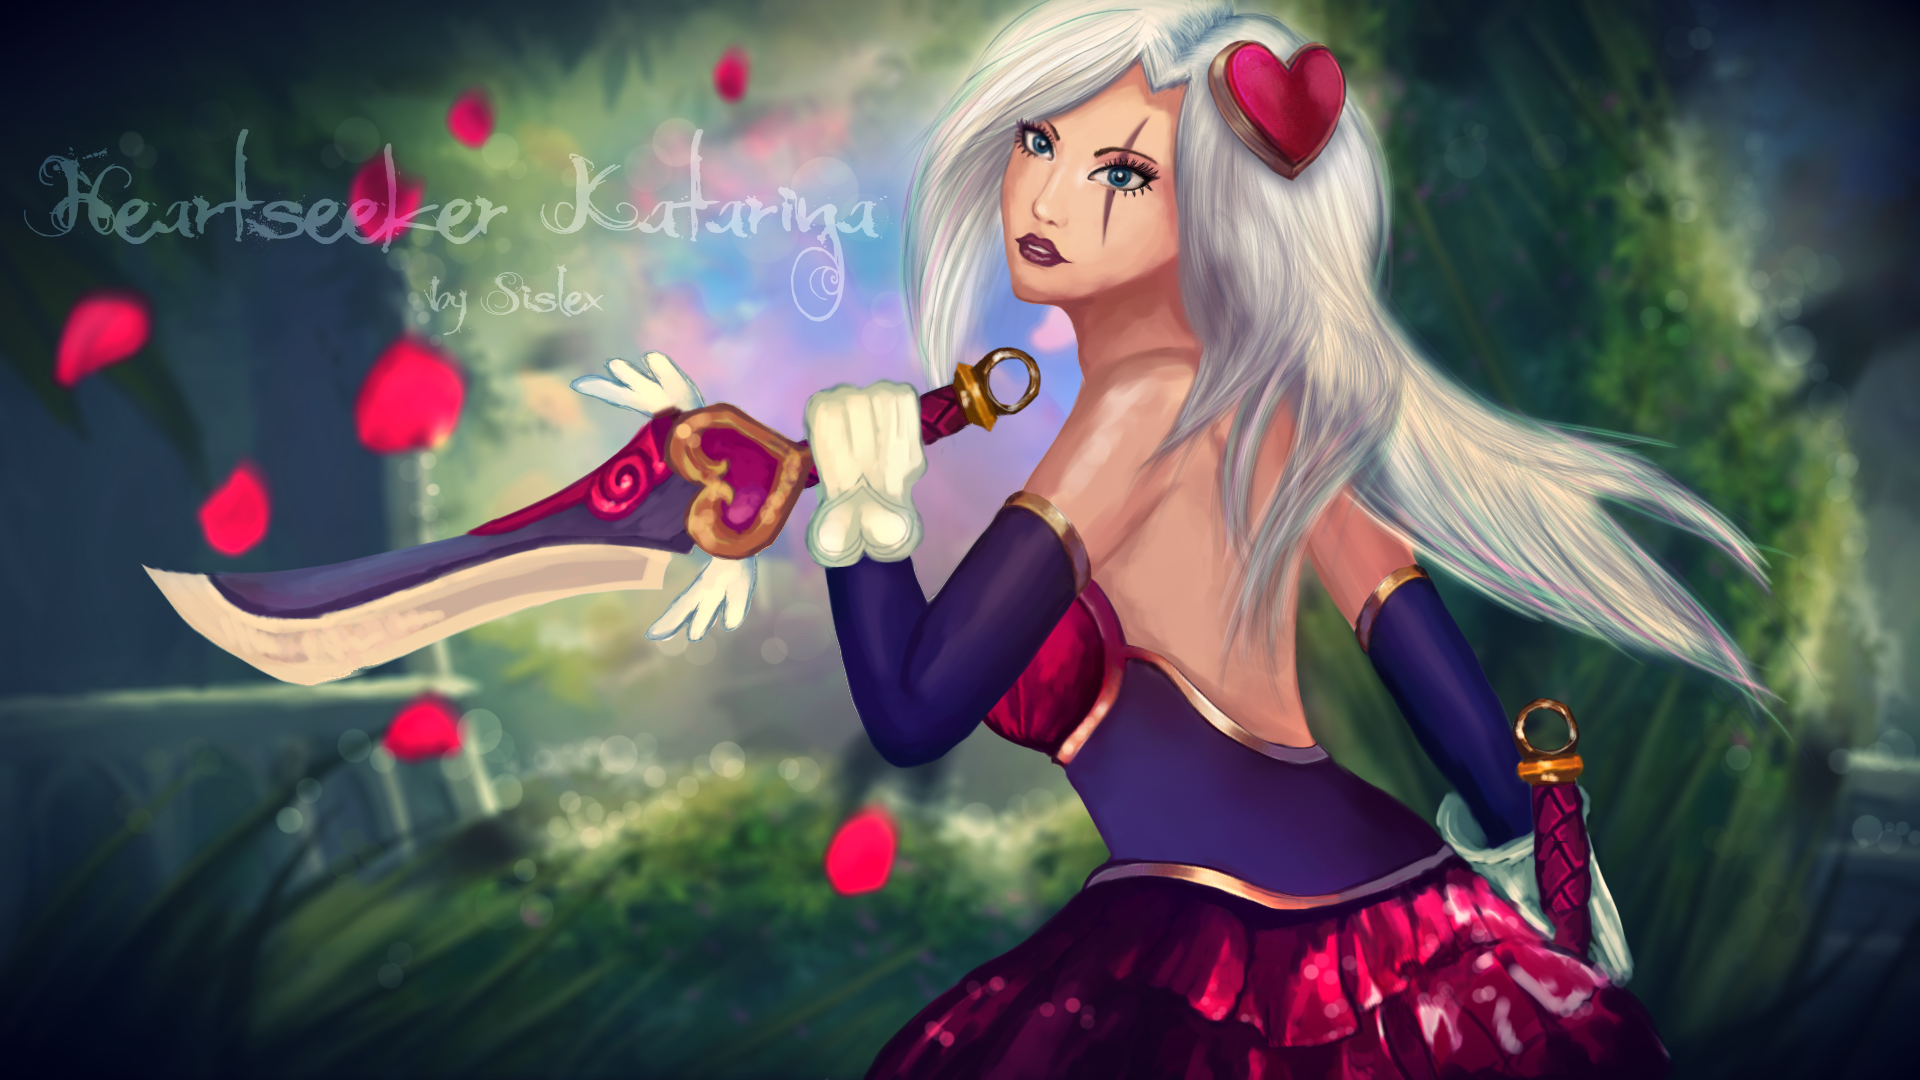 Heartseeker Katarina